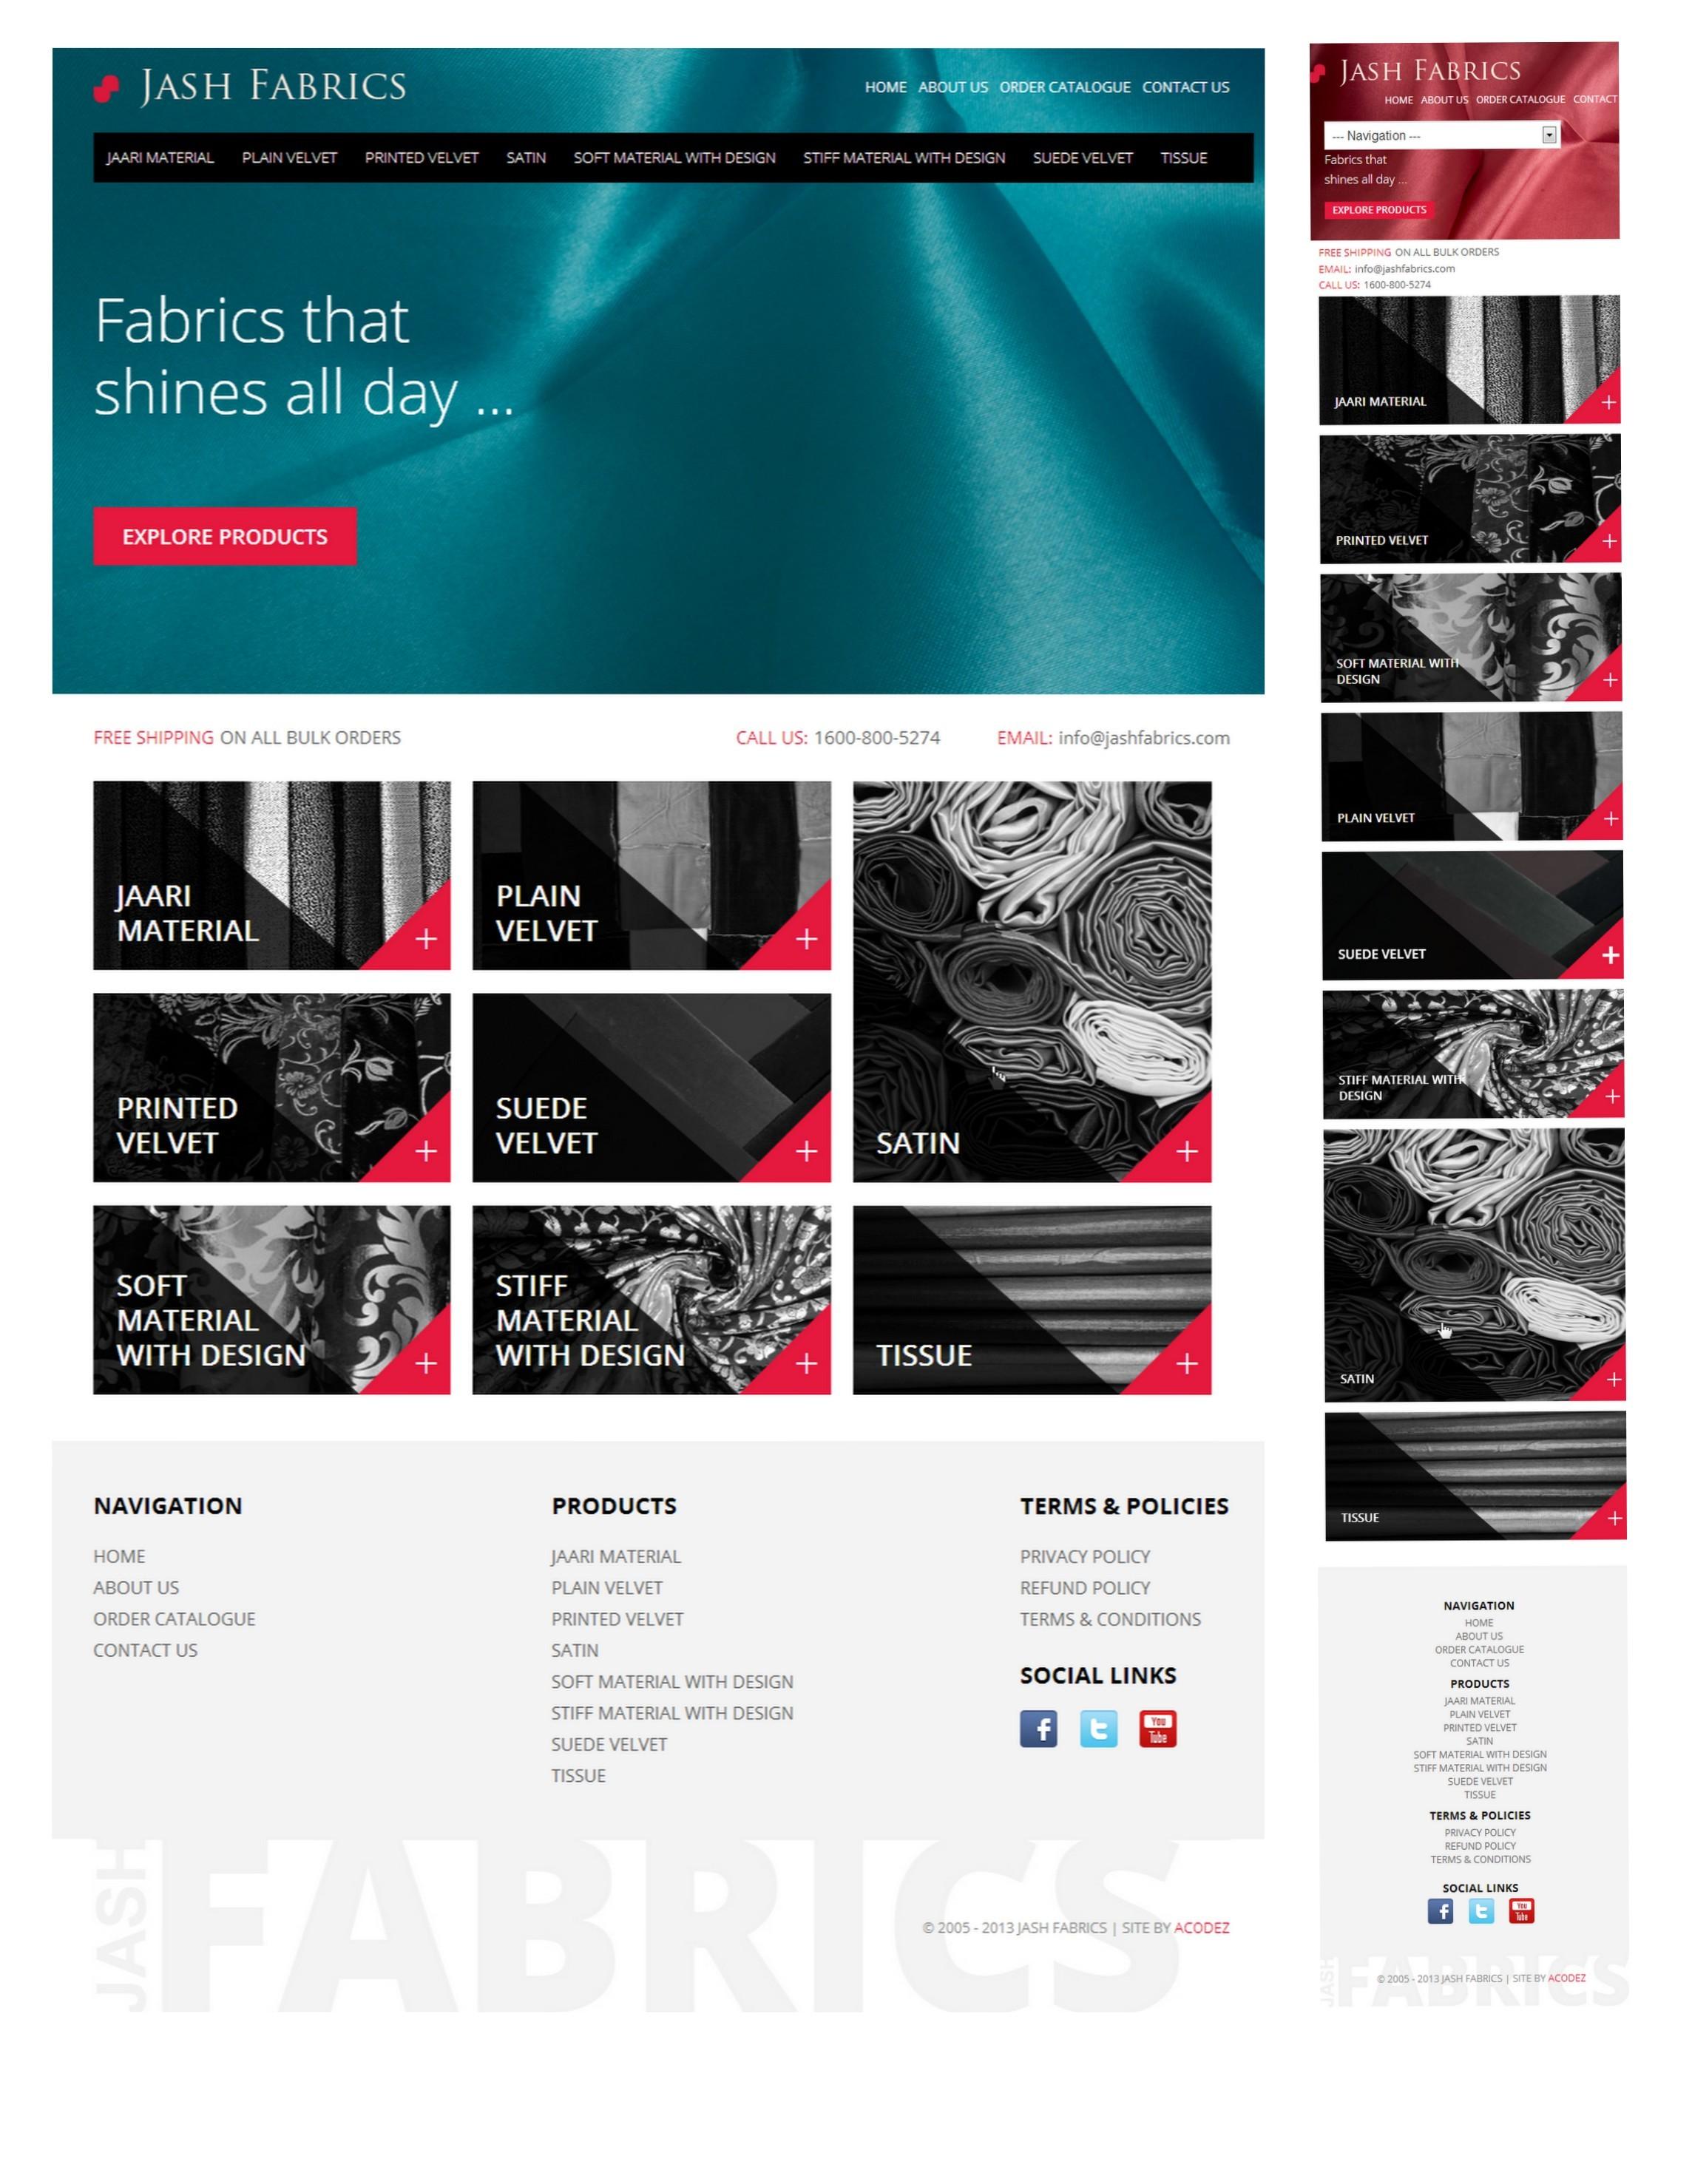 Web page designing services popular web design technologies - Asp net home page design ...